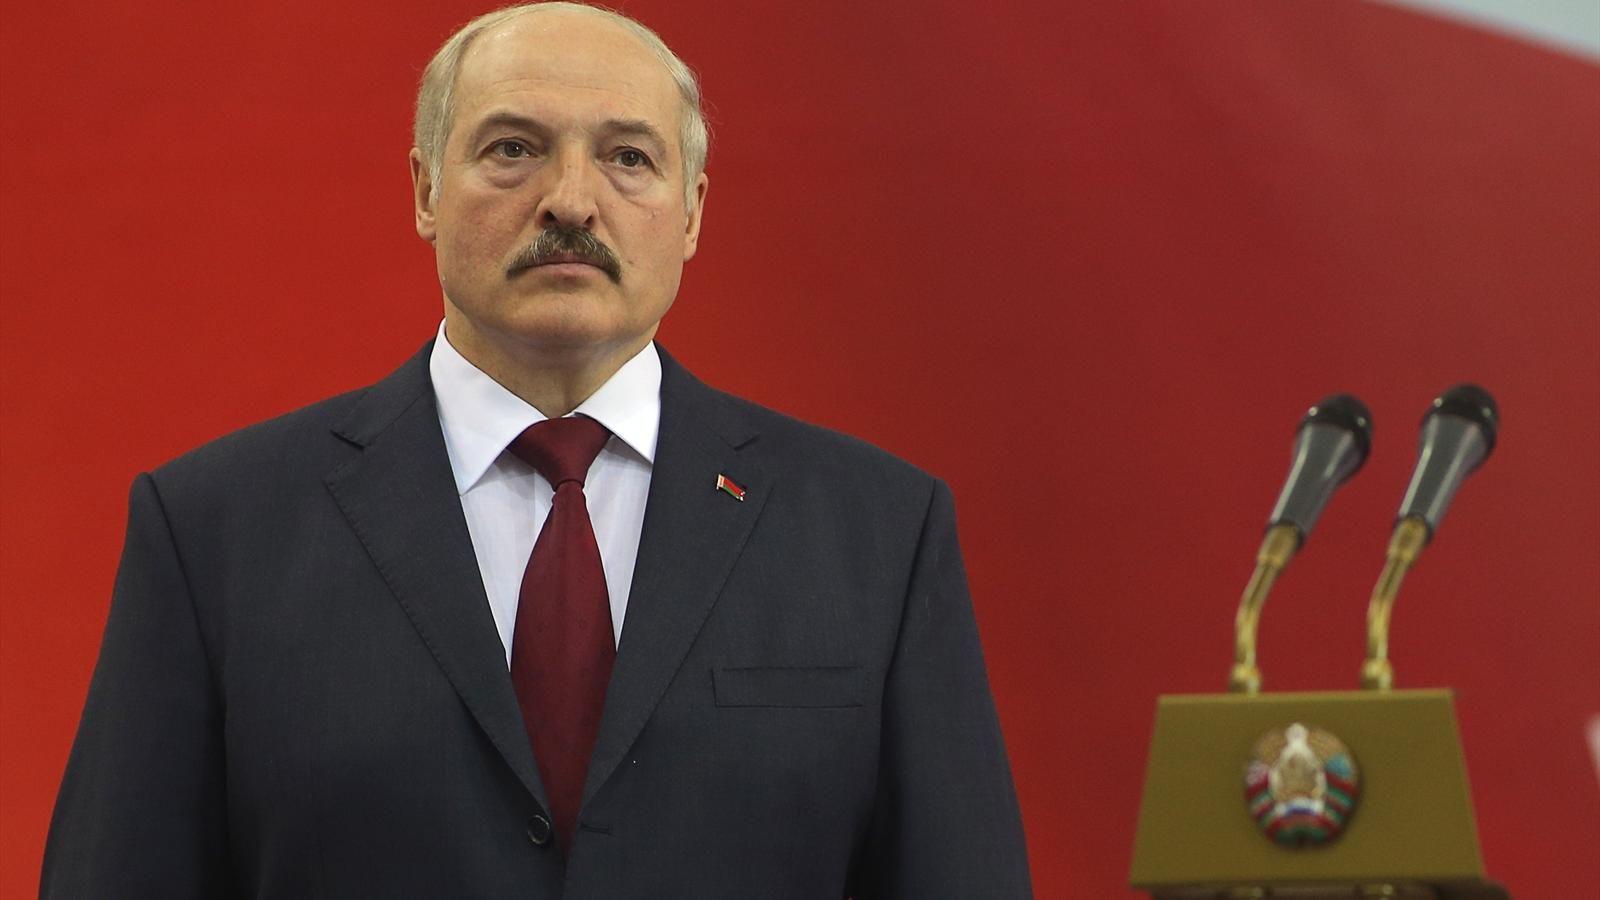 Aleksandr Grigorievič Lukashenko